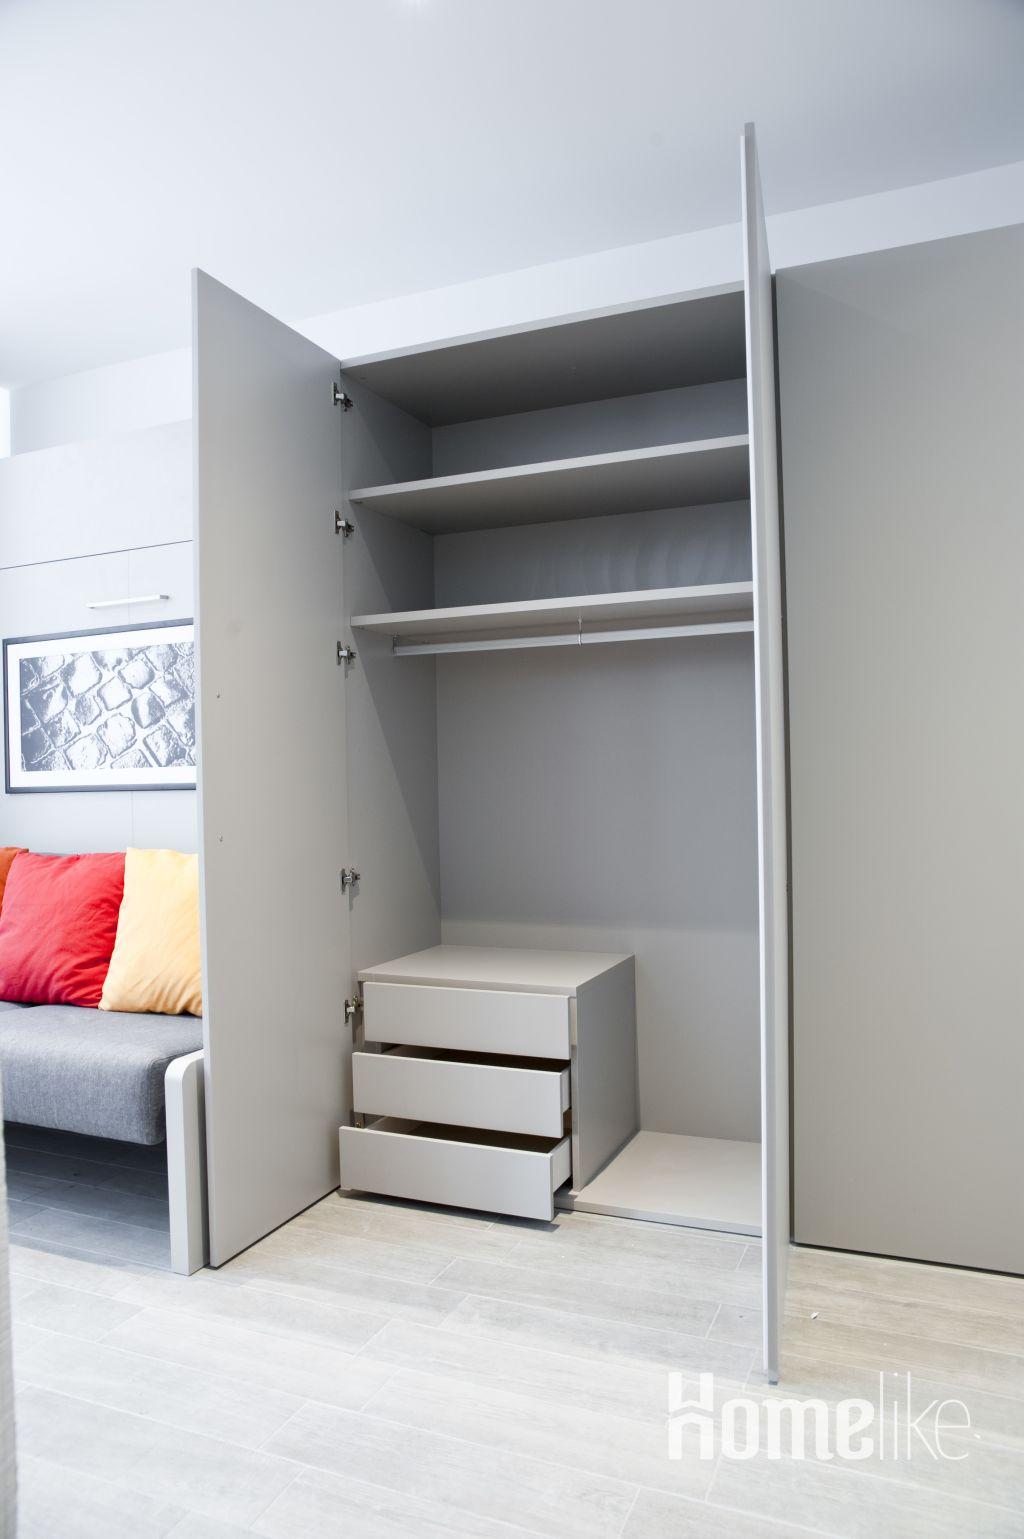 image 3 furnished 1 bedroom Apartment for rent in Innenstadt, Frankfurt